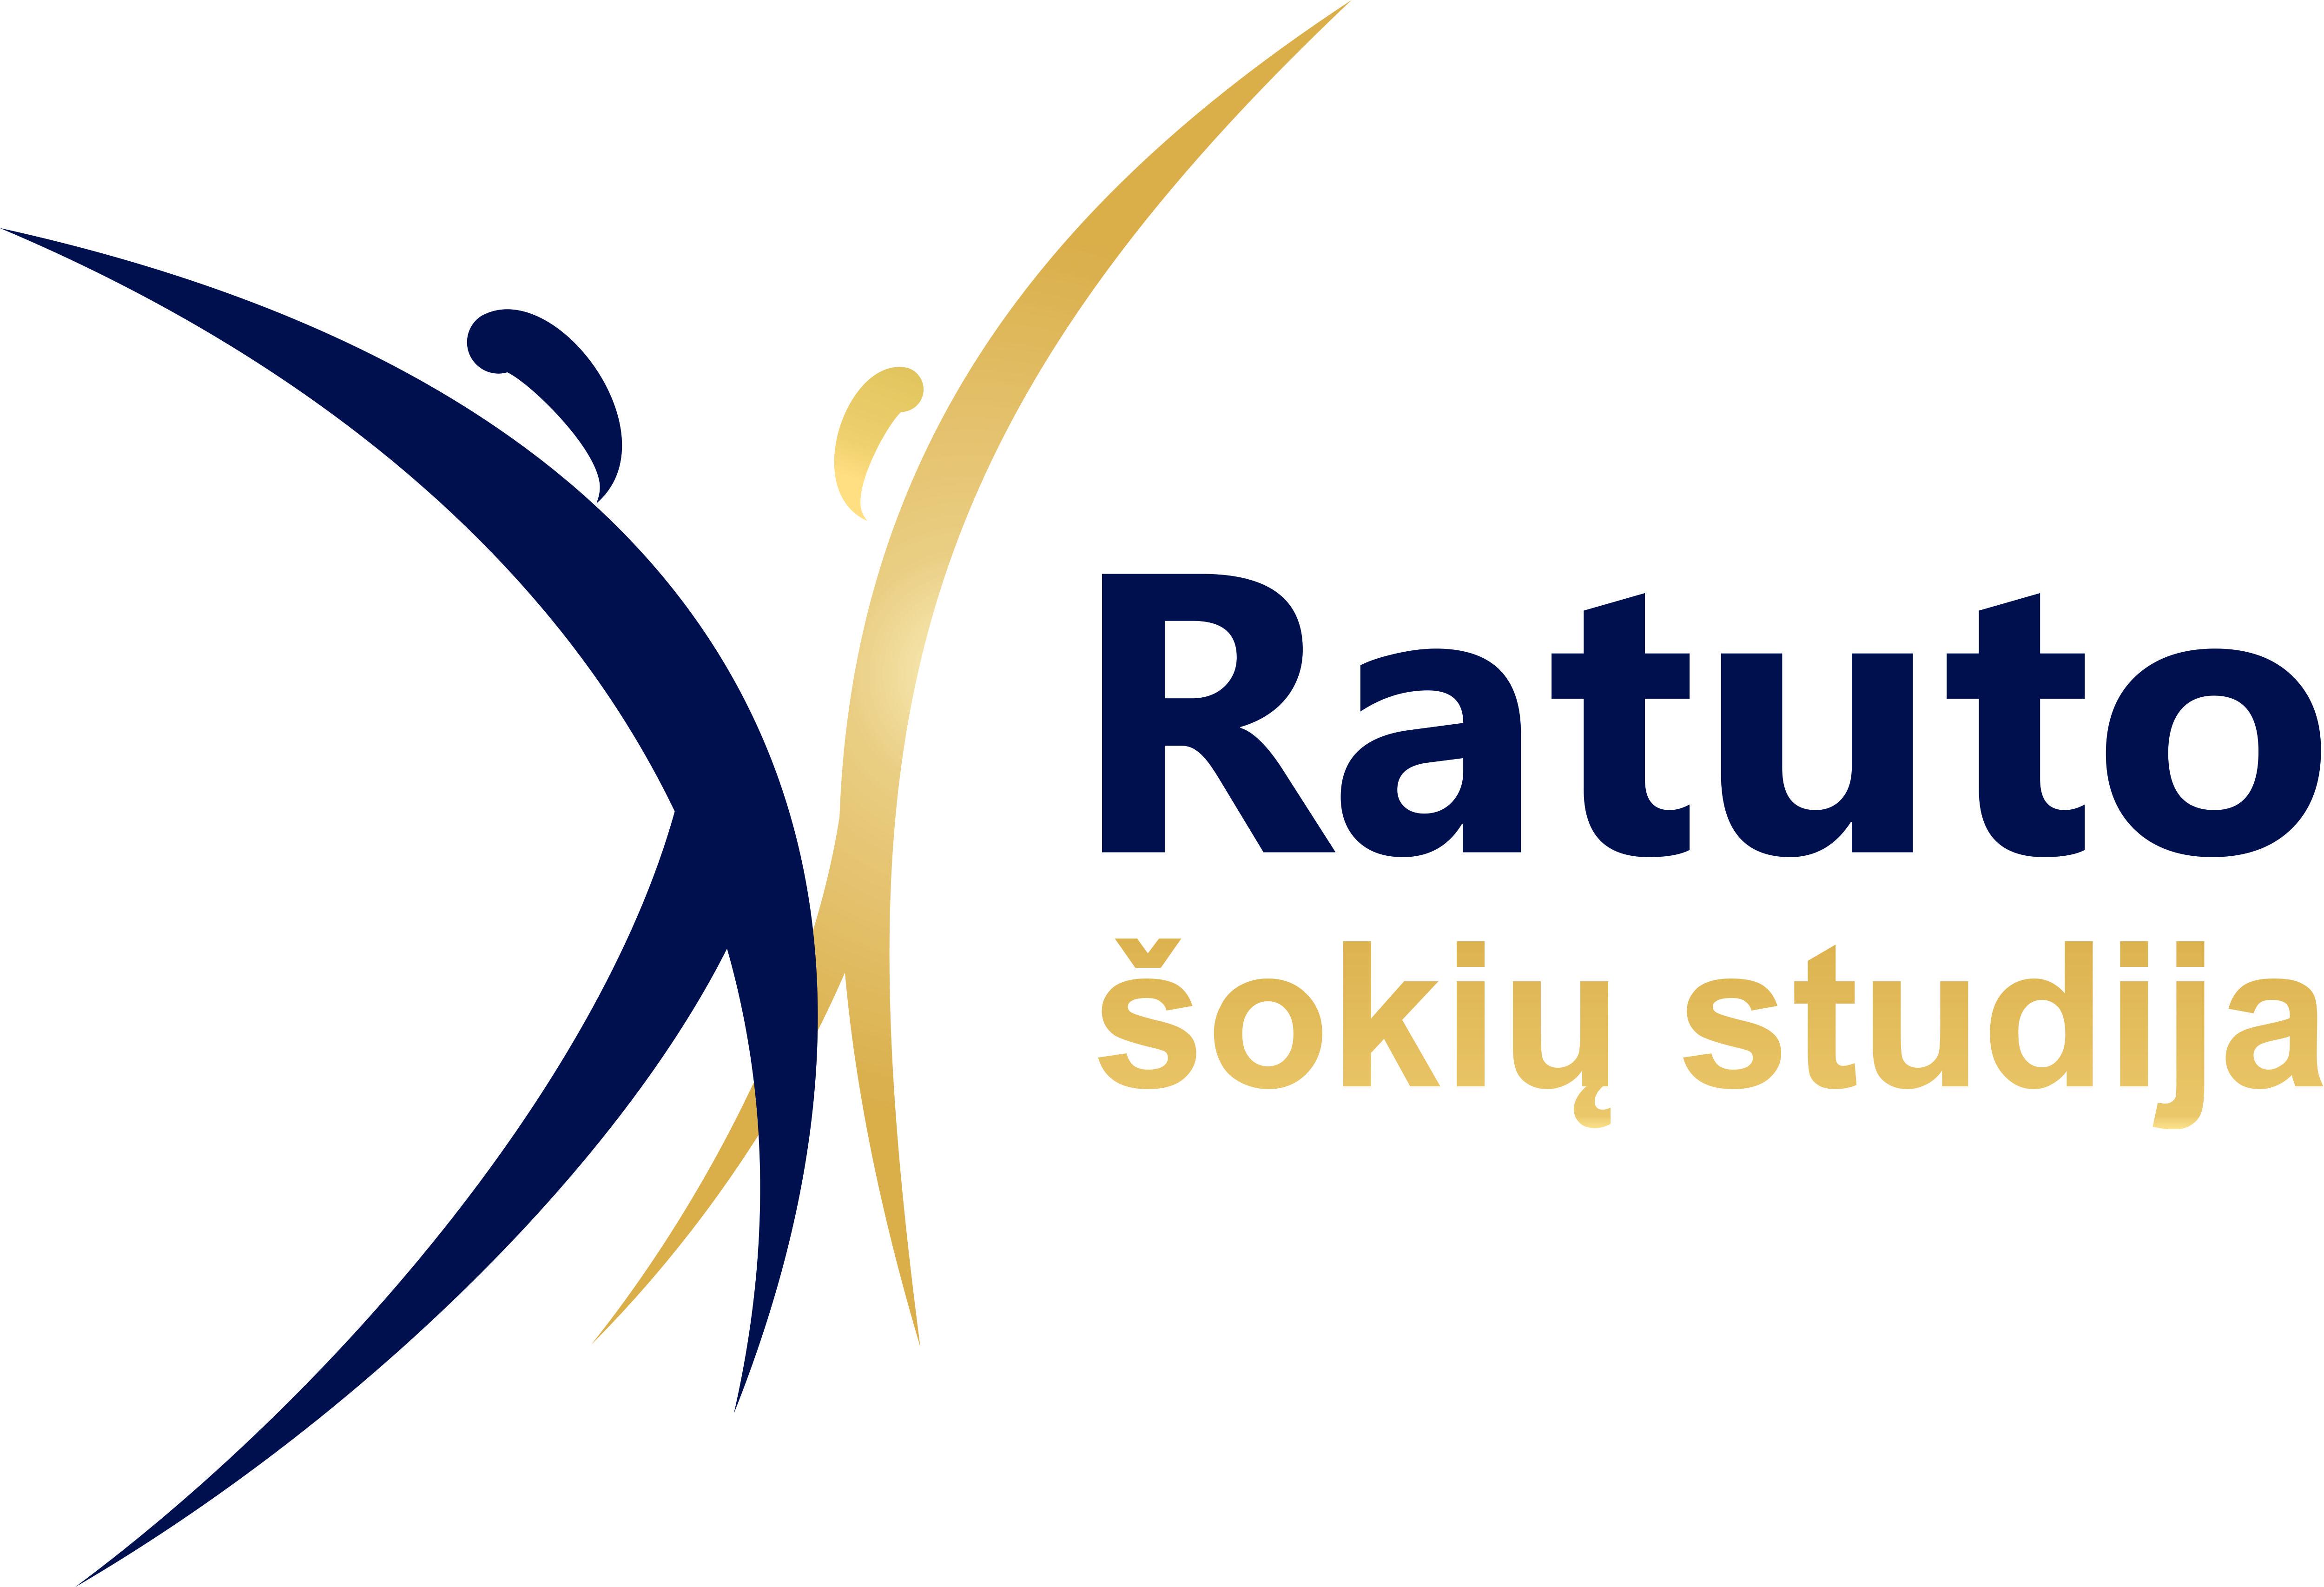 RATUTO SOKIU STUDIJA lt gold